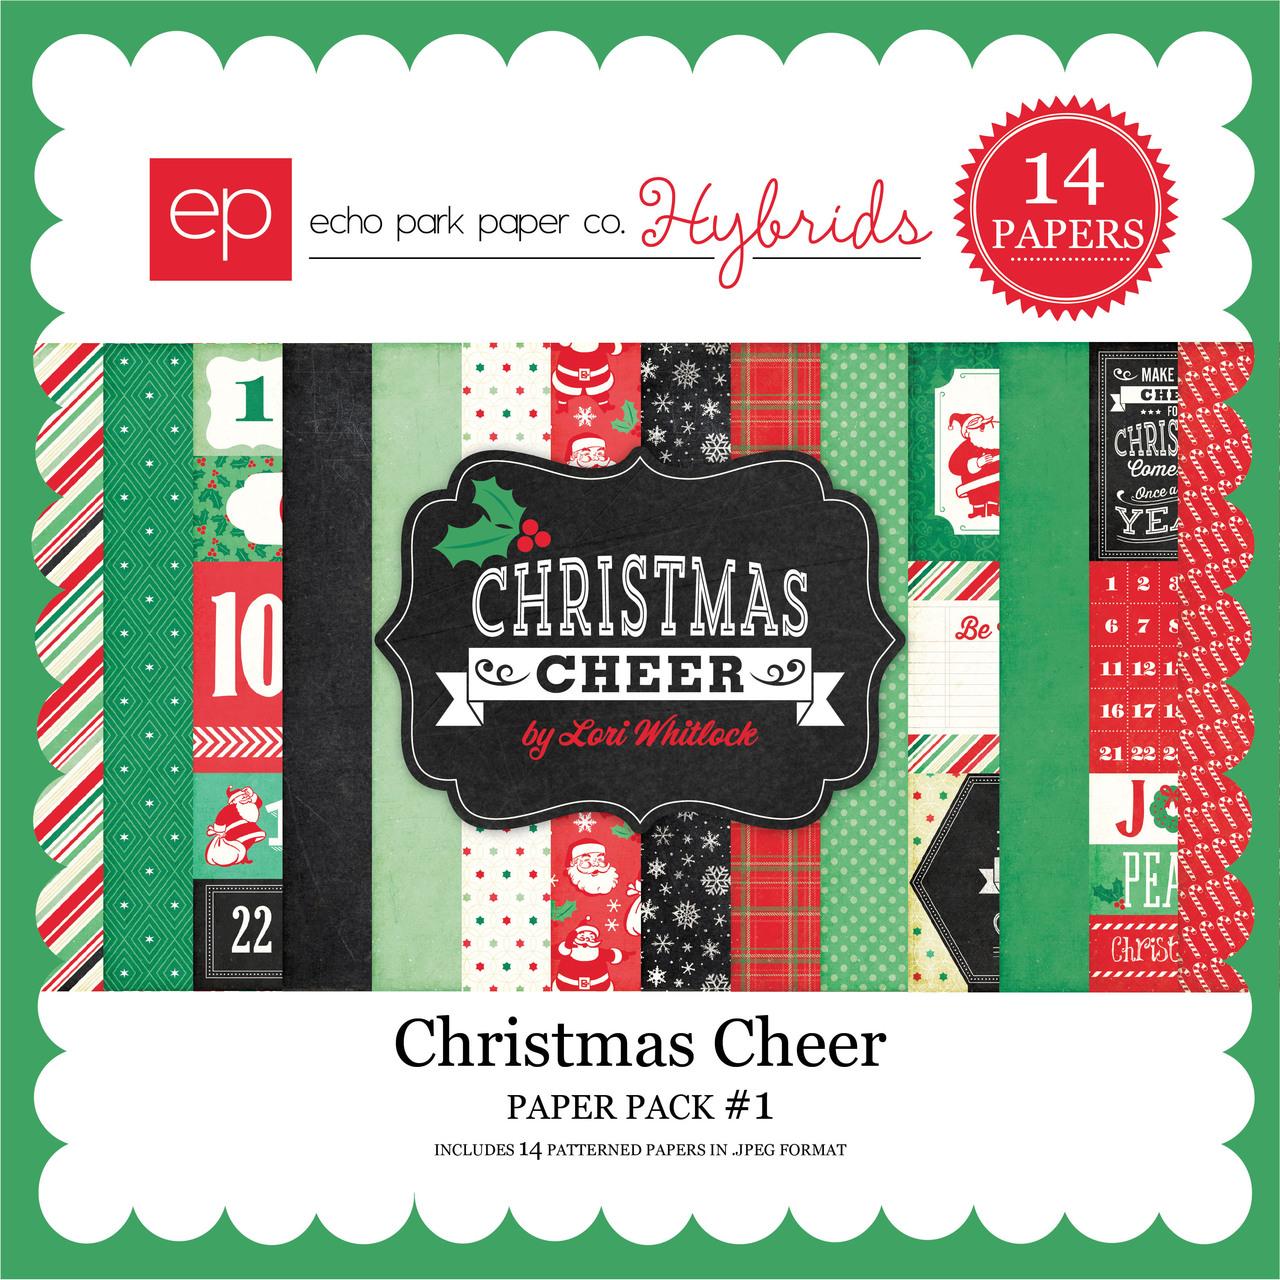 Christmas Cheer Paper Pack #1